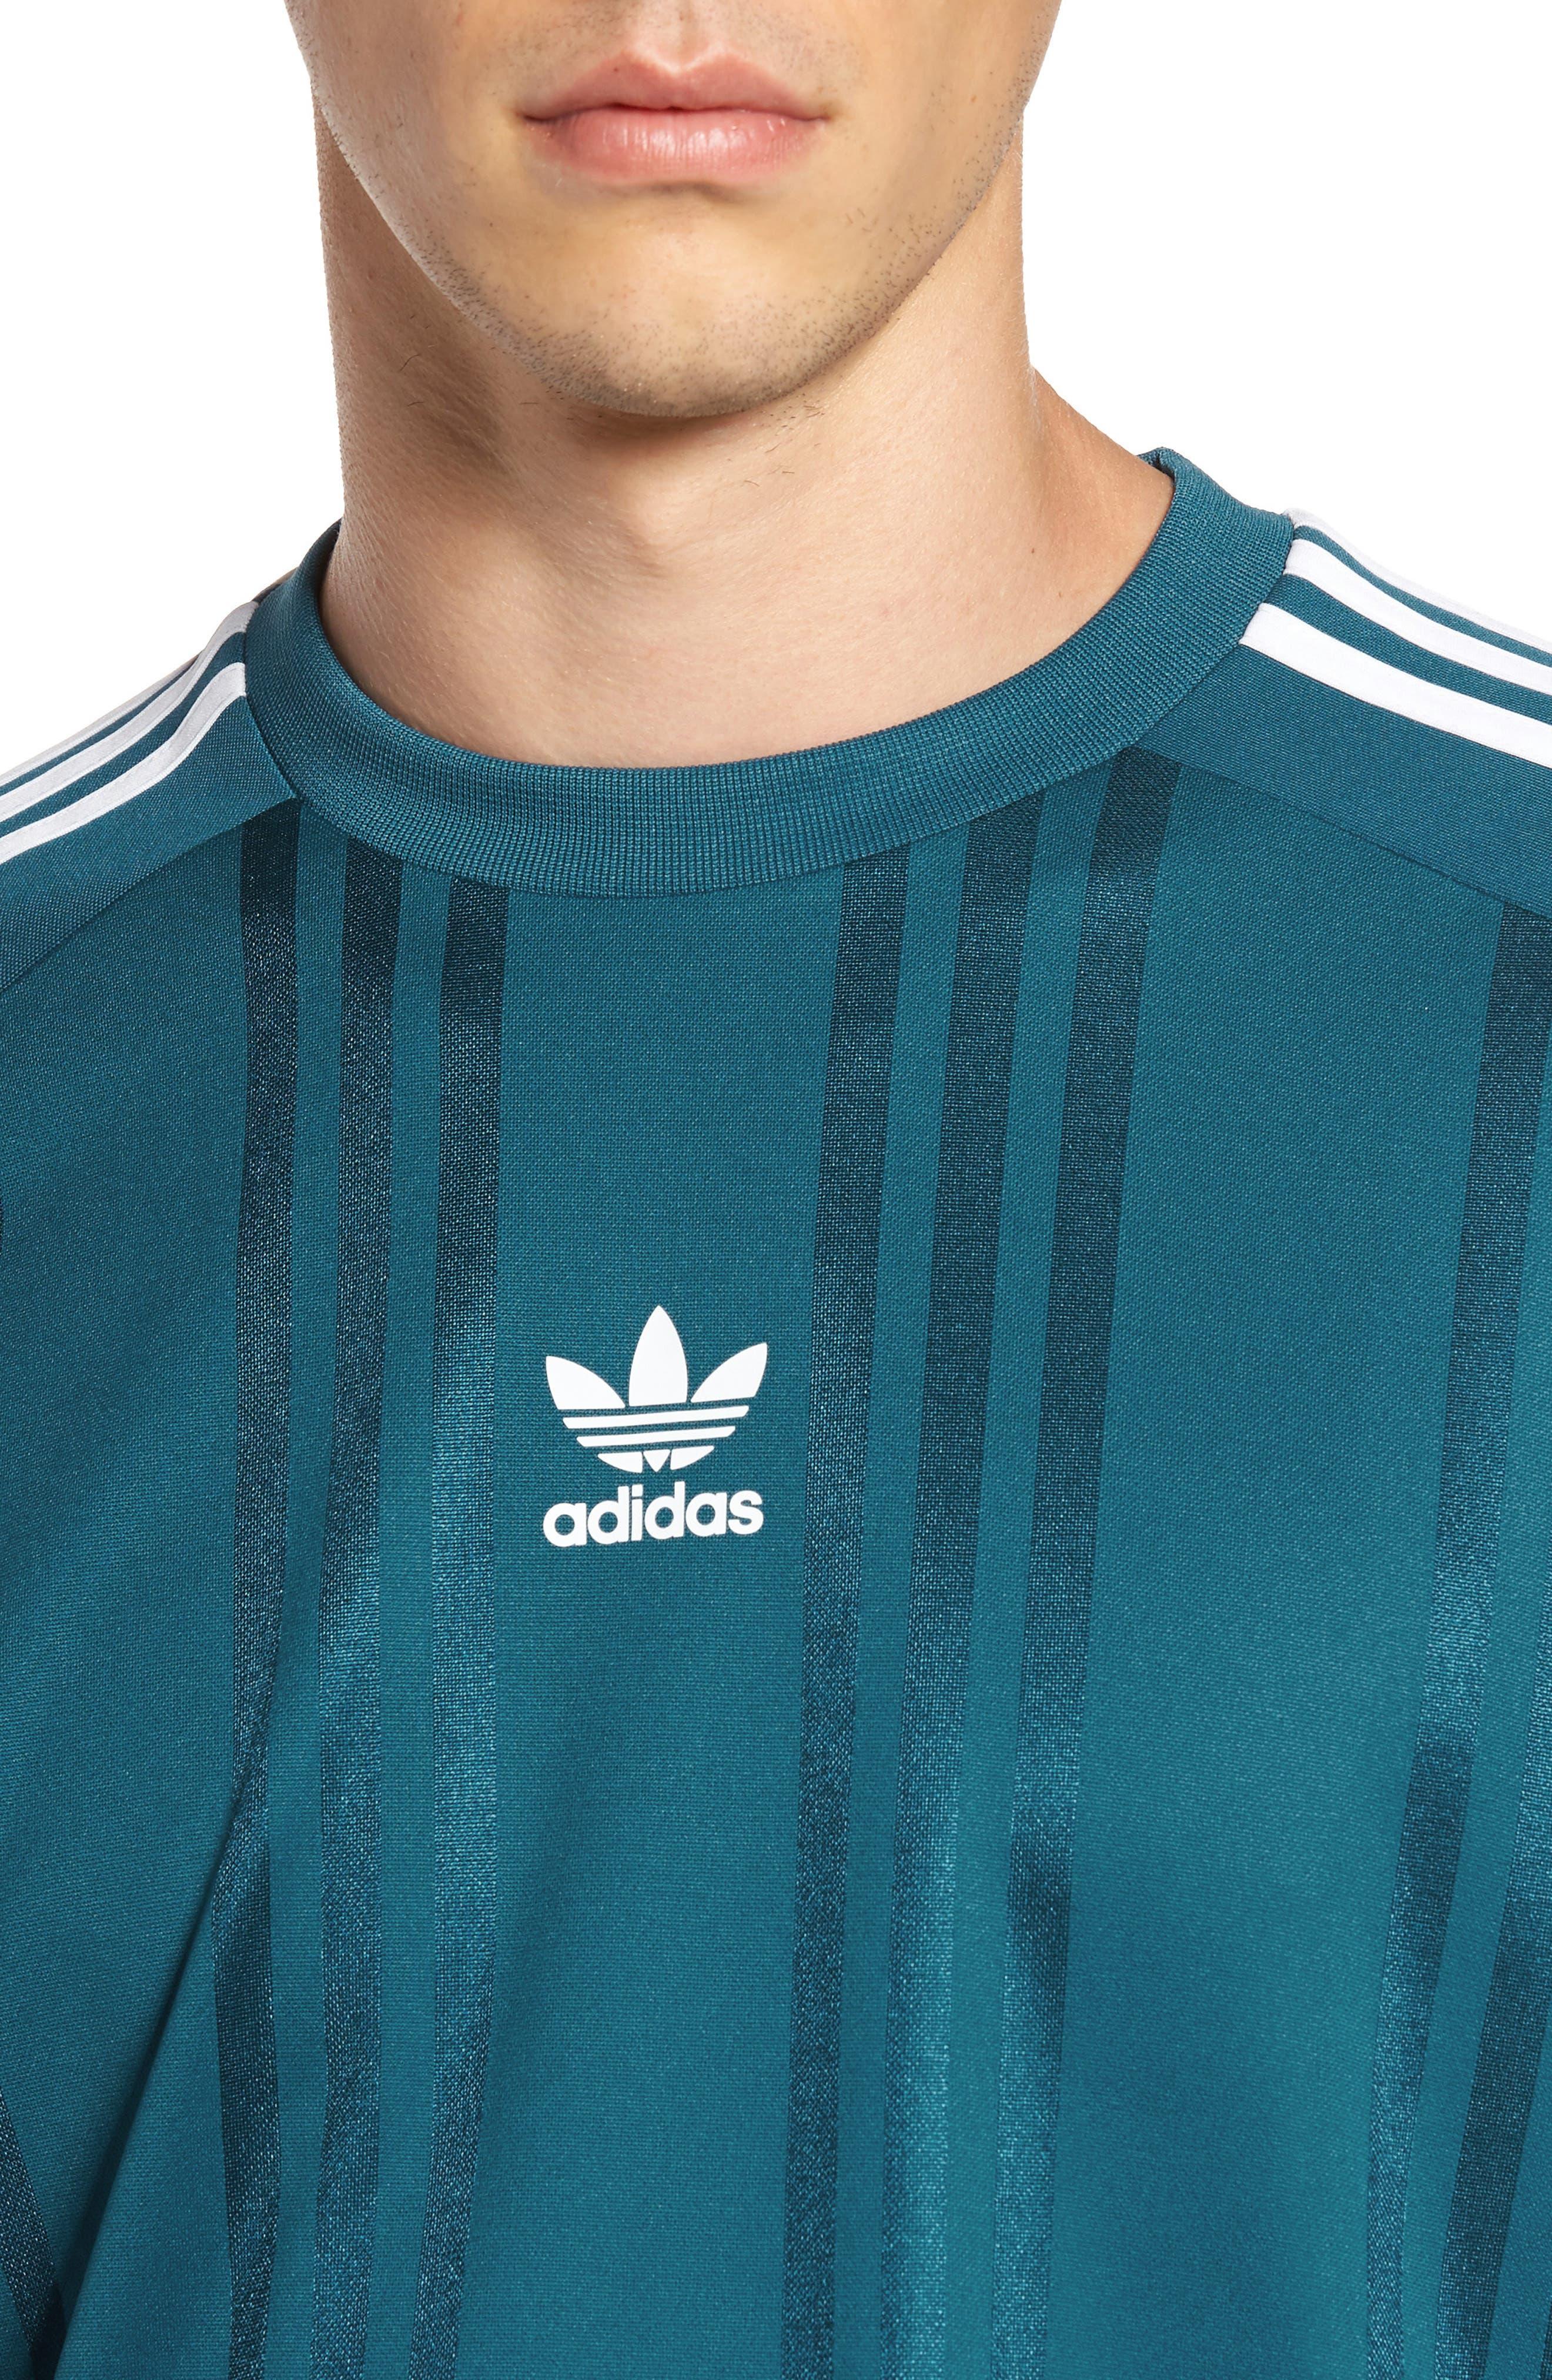 Originals Jacquard Stripe T-Shirt,                             Alternate thumbnail 4, color,                             Real Teal